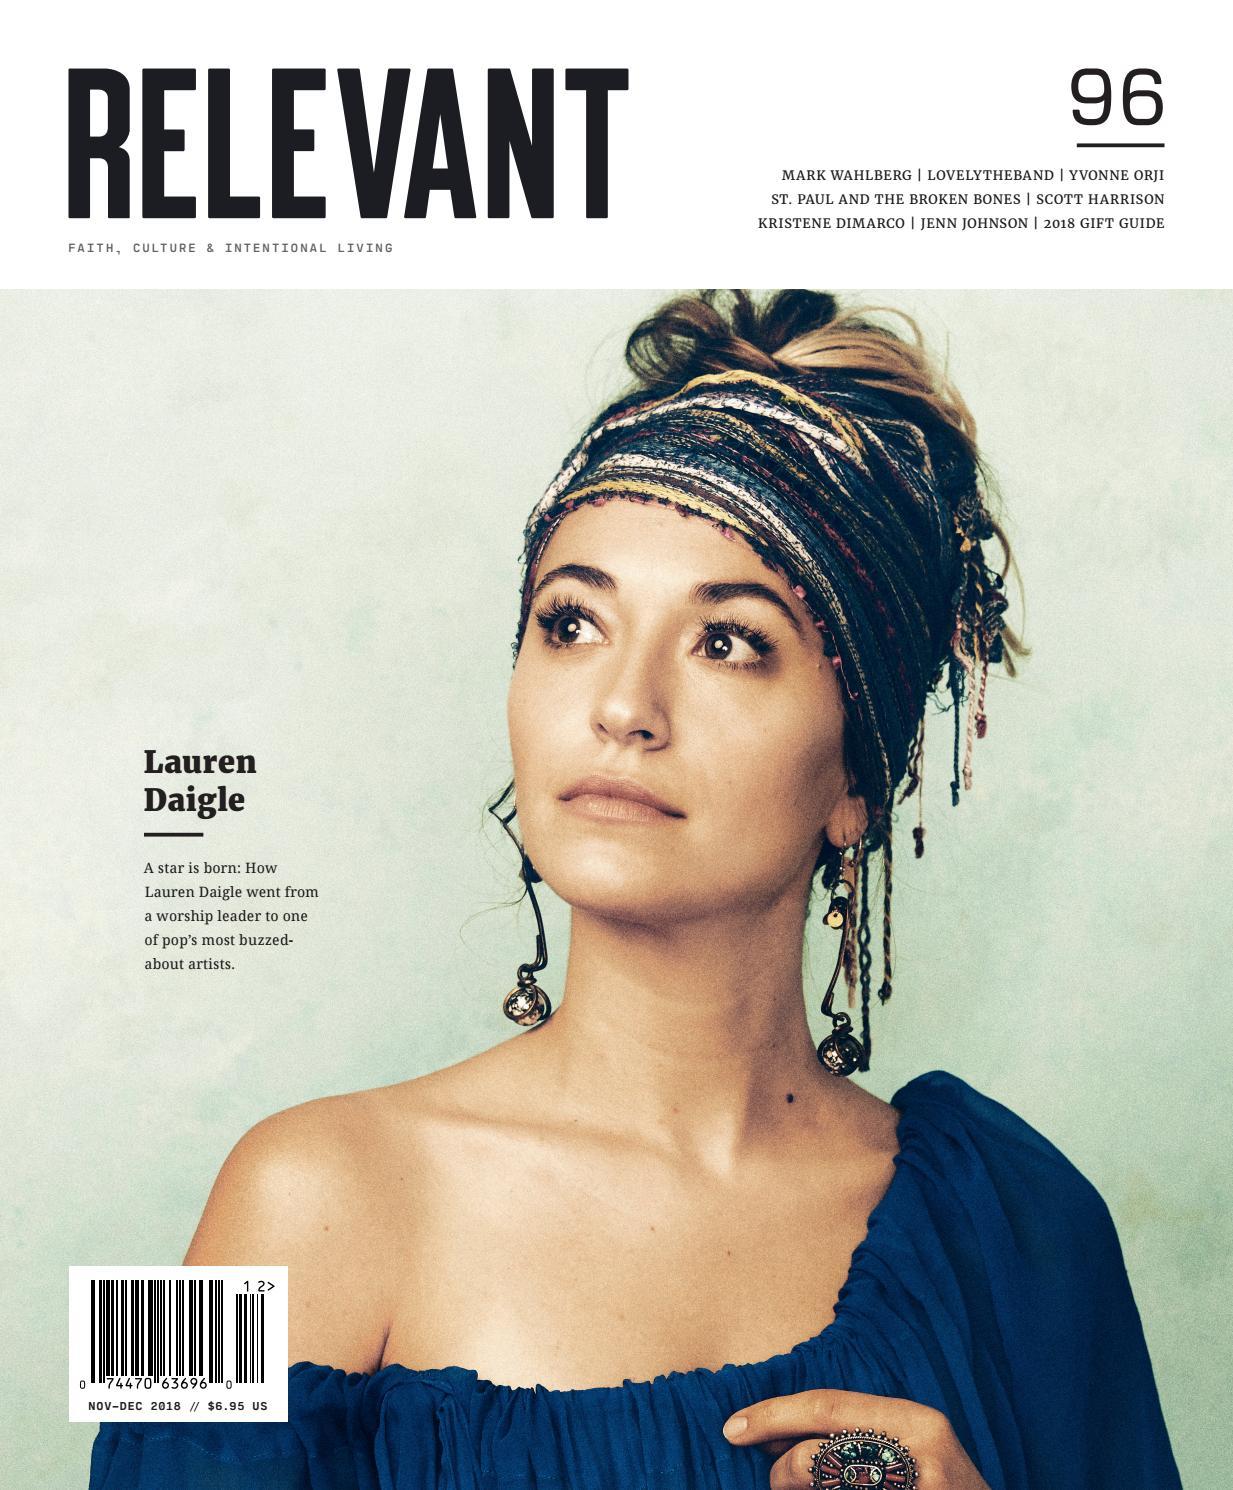 RELEVANT - Issue 96 - November/December 2018 by RELEVANT